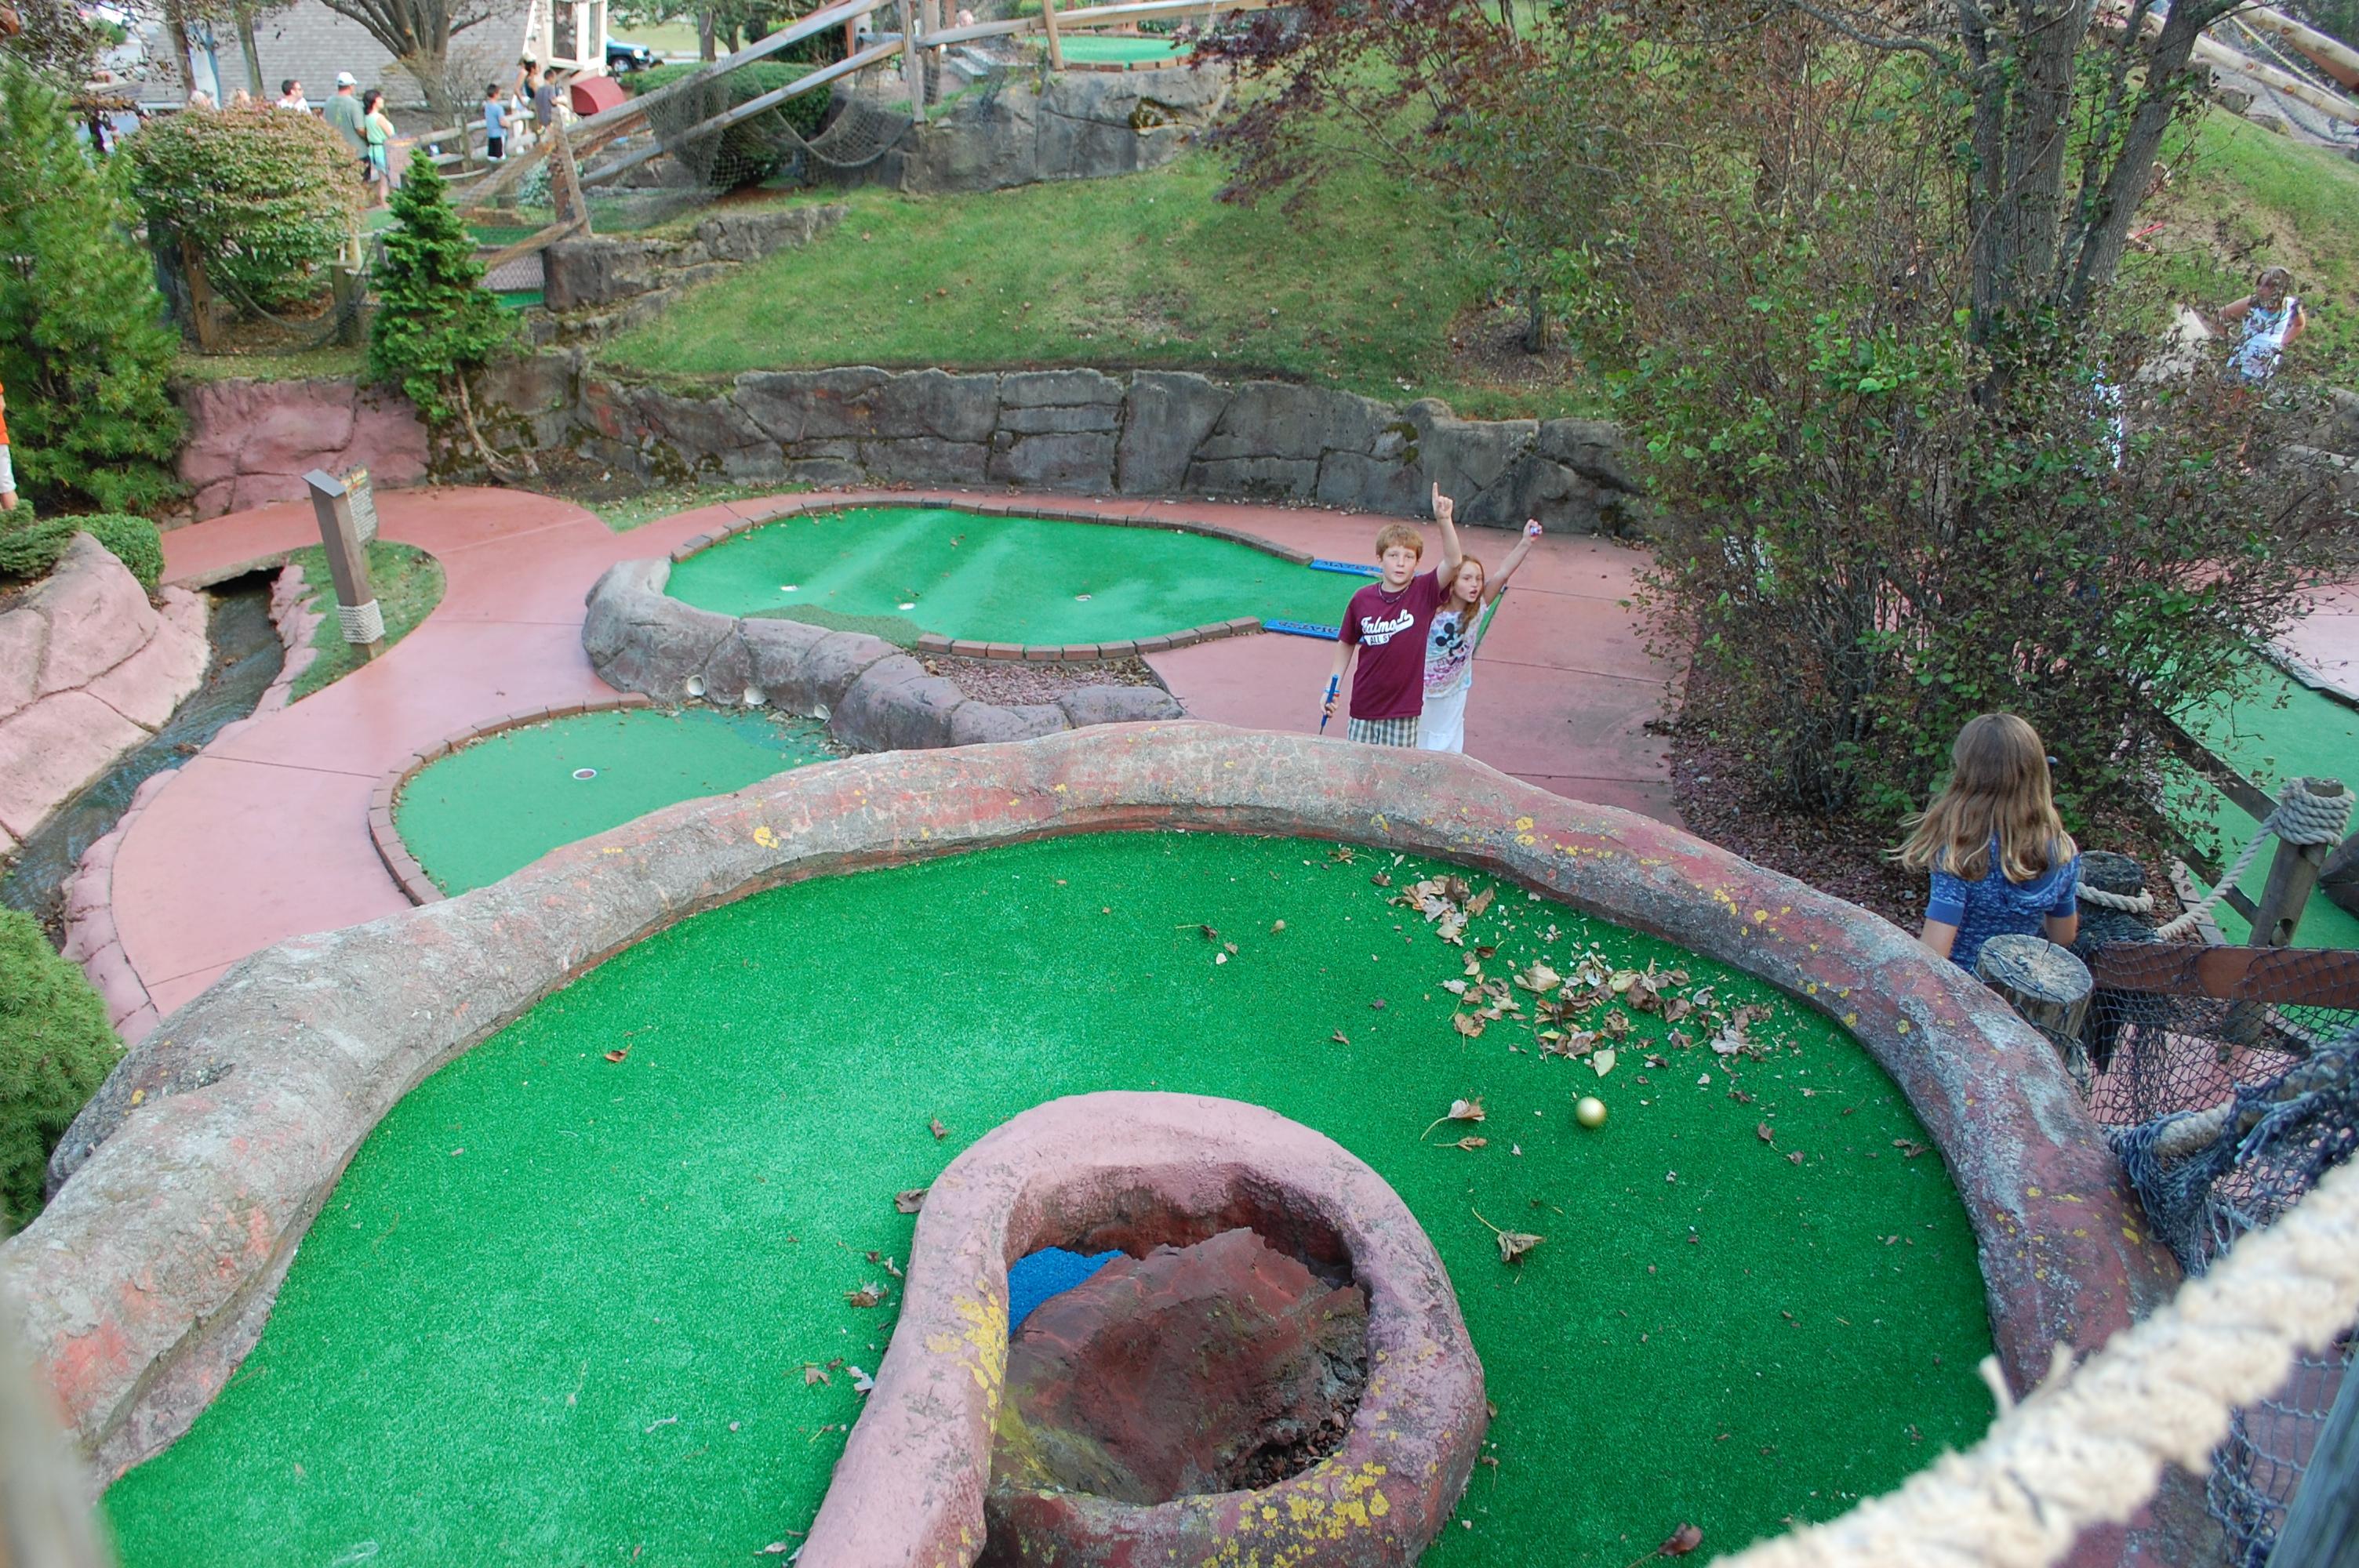 sightseeing saturday u2013 pirate u0027s cove adventure golf review and